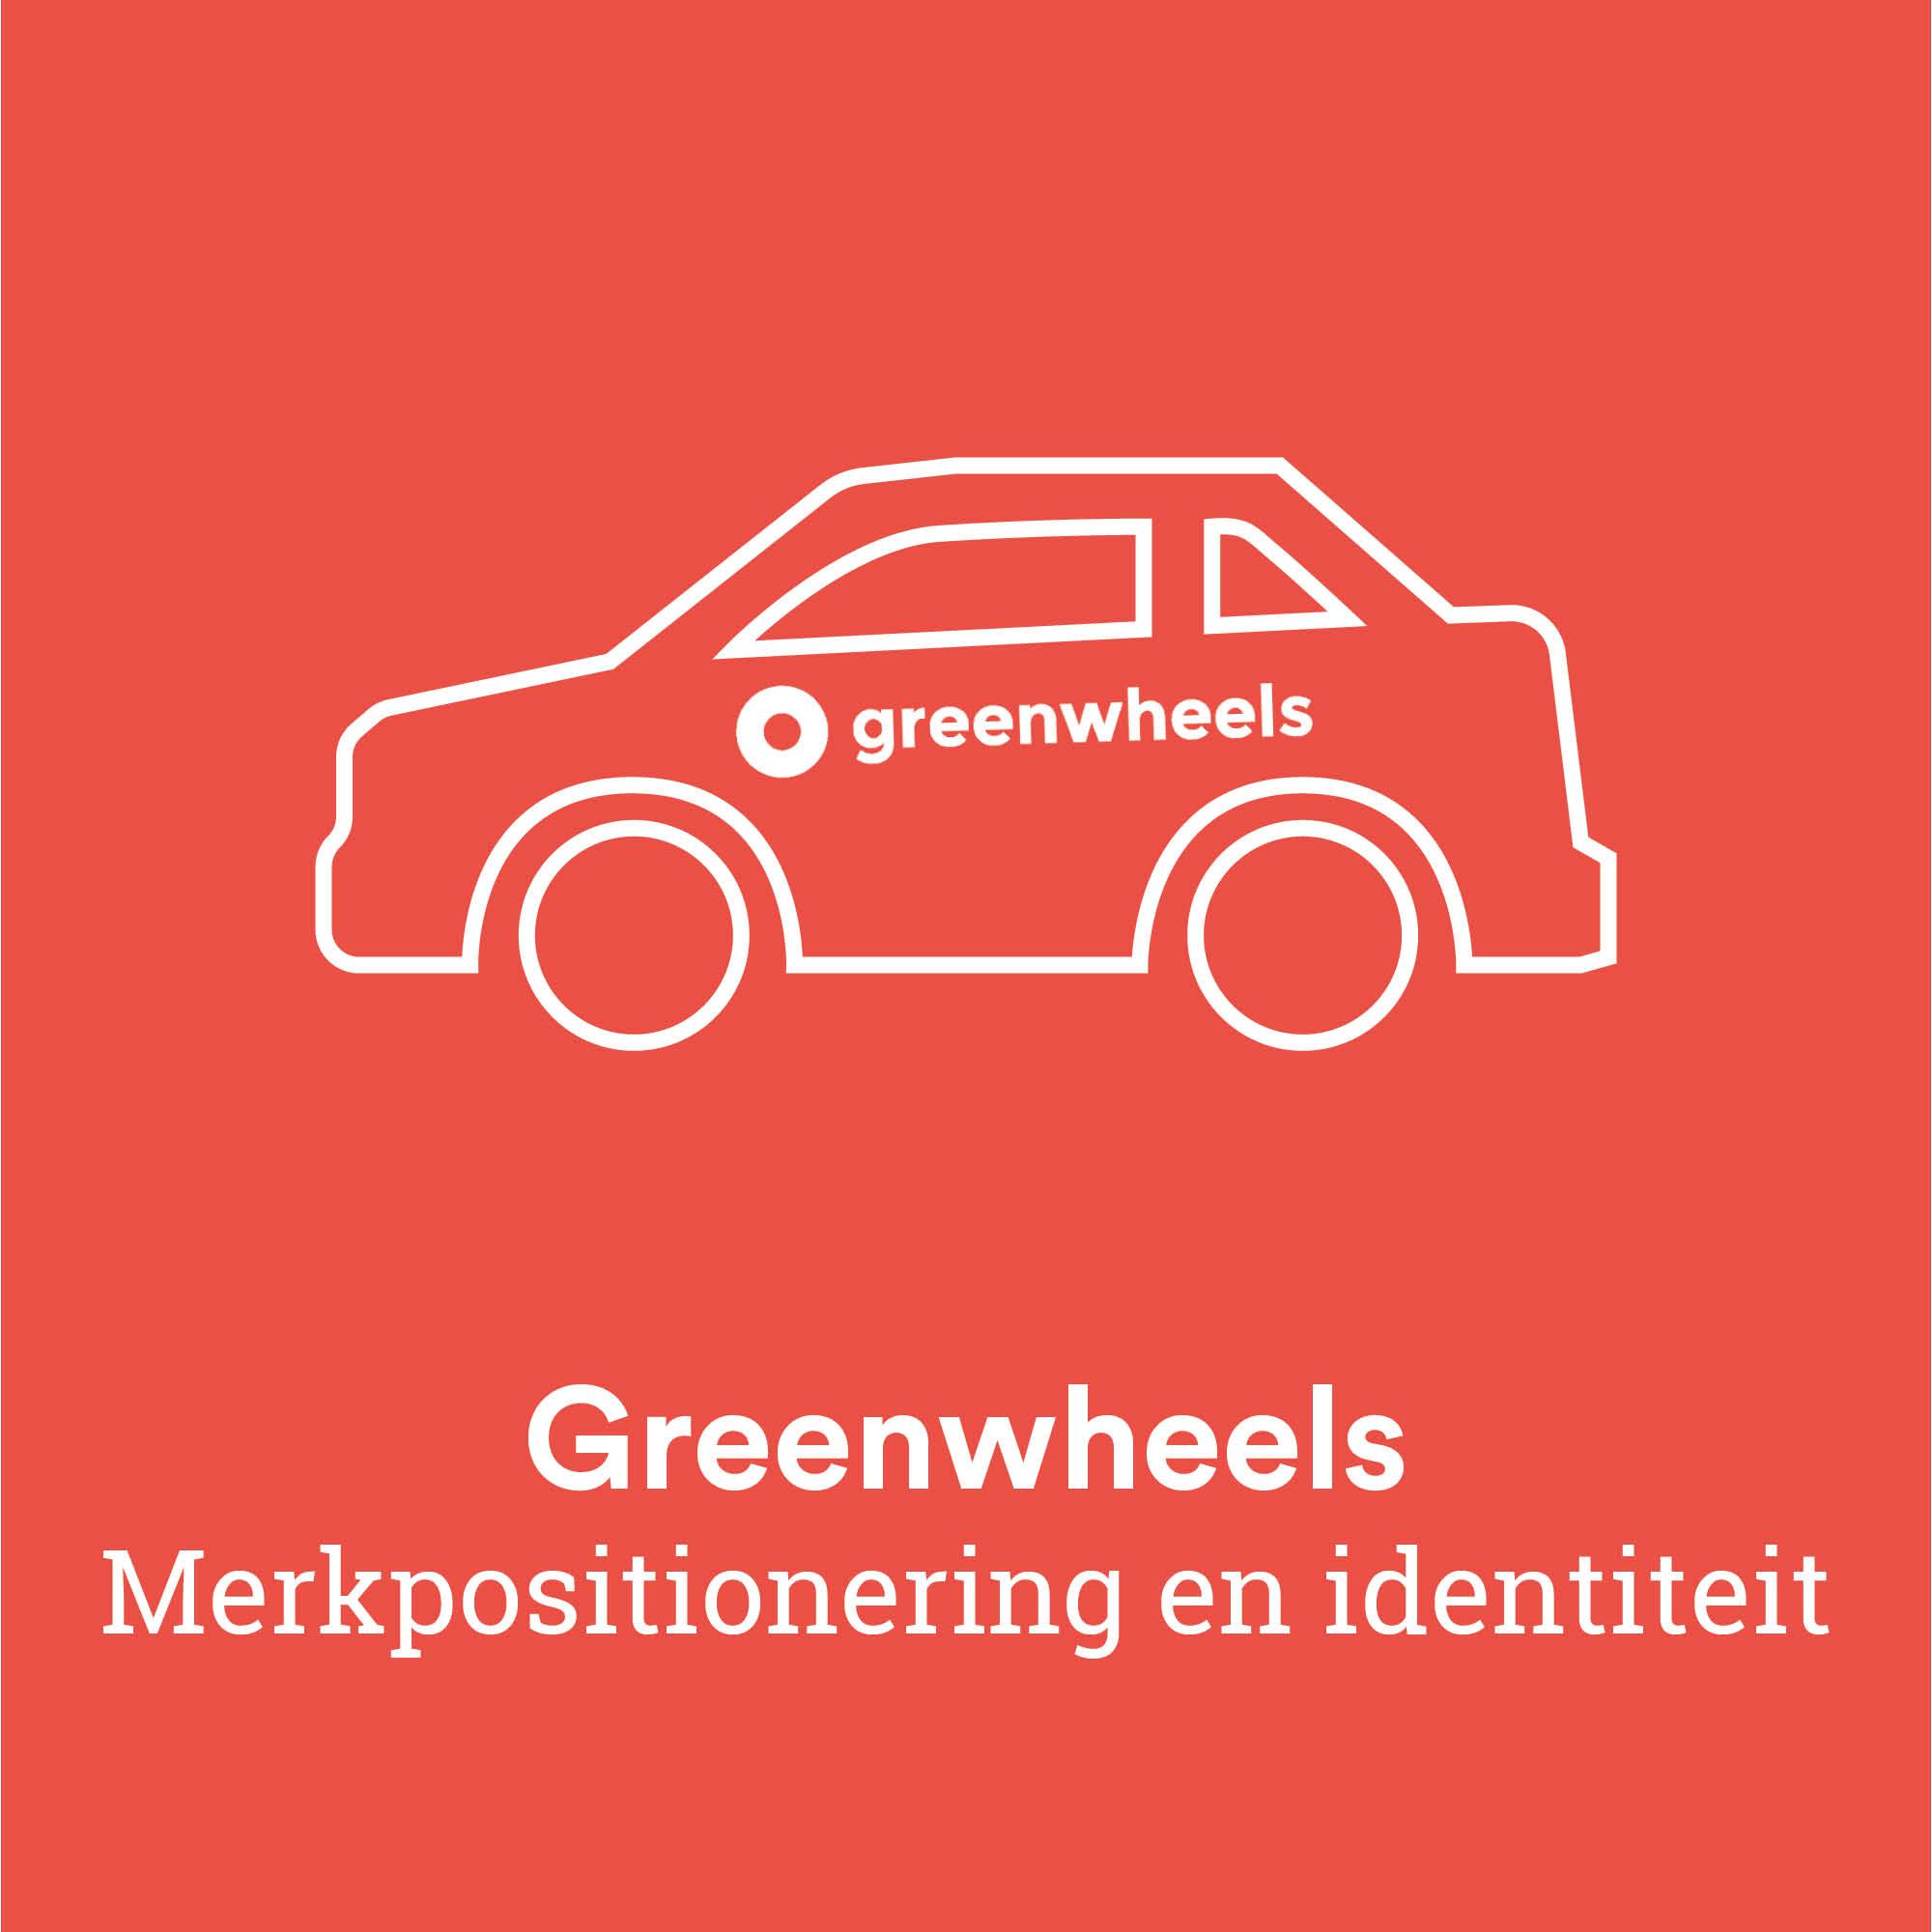 Greenwheels merkpositionering en identiteit